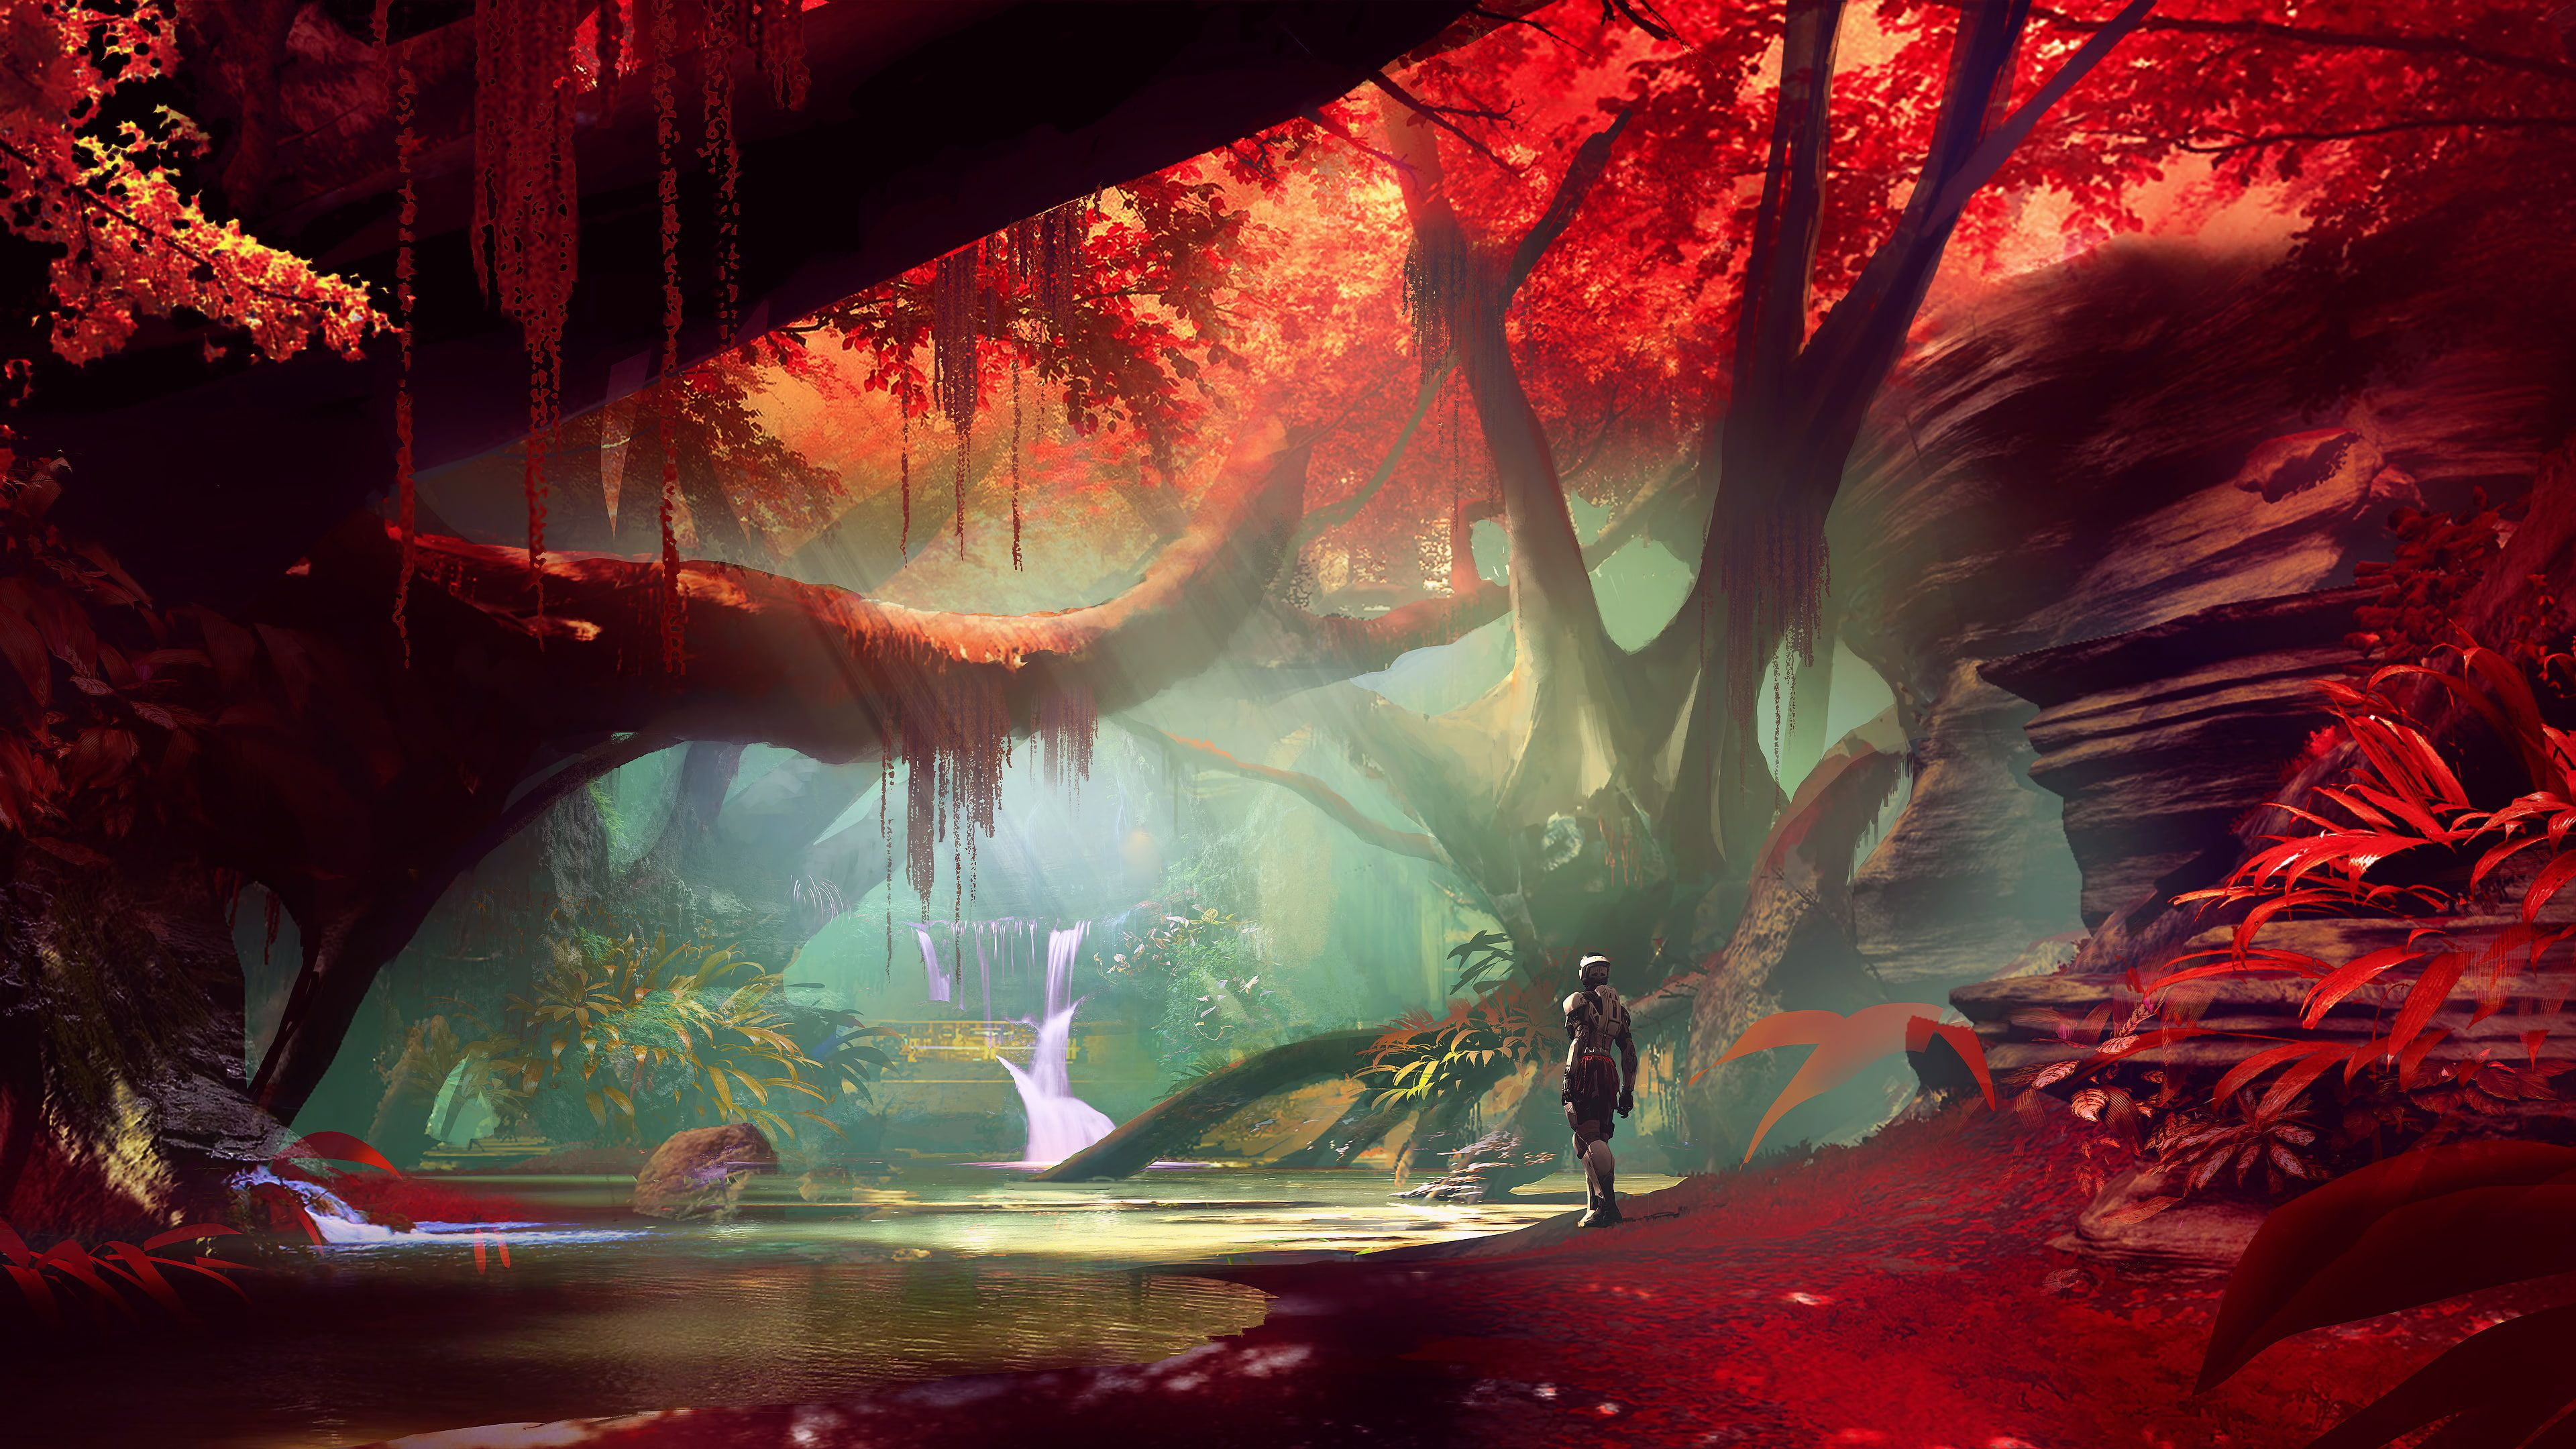 Fantasy Art Fan Art Artwork Landscape Digital Art Concept Art Water Plants Trees Destiny Video Game Video Games 4k Concept Art Fantasy Art Art Pictures